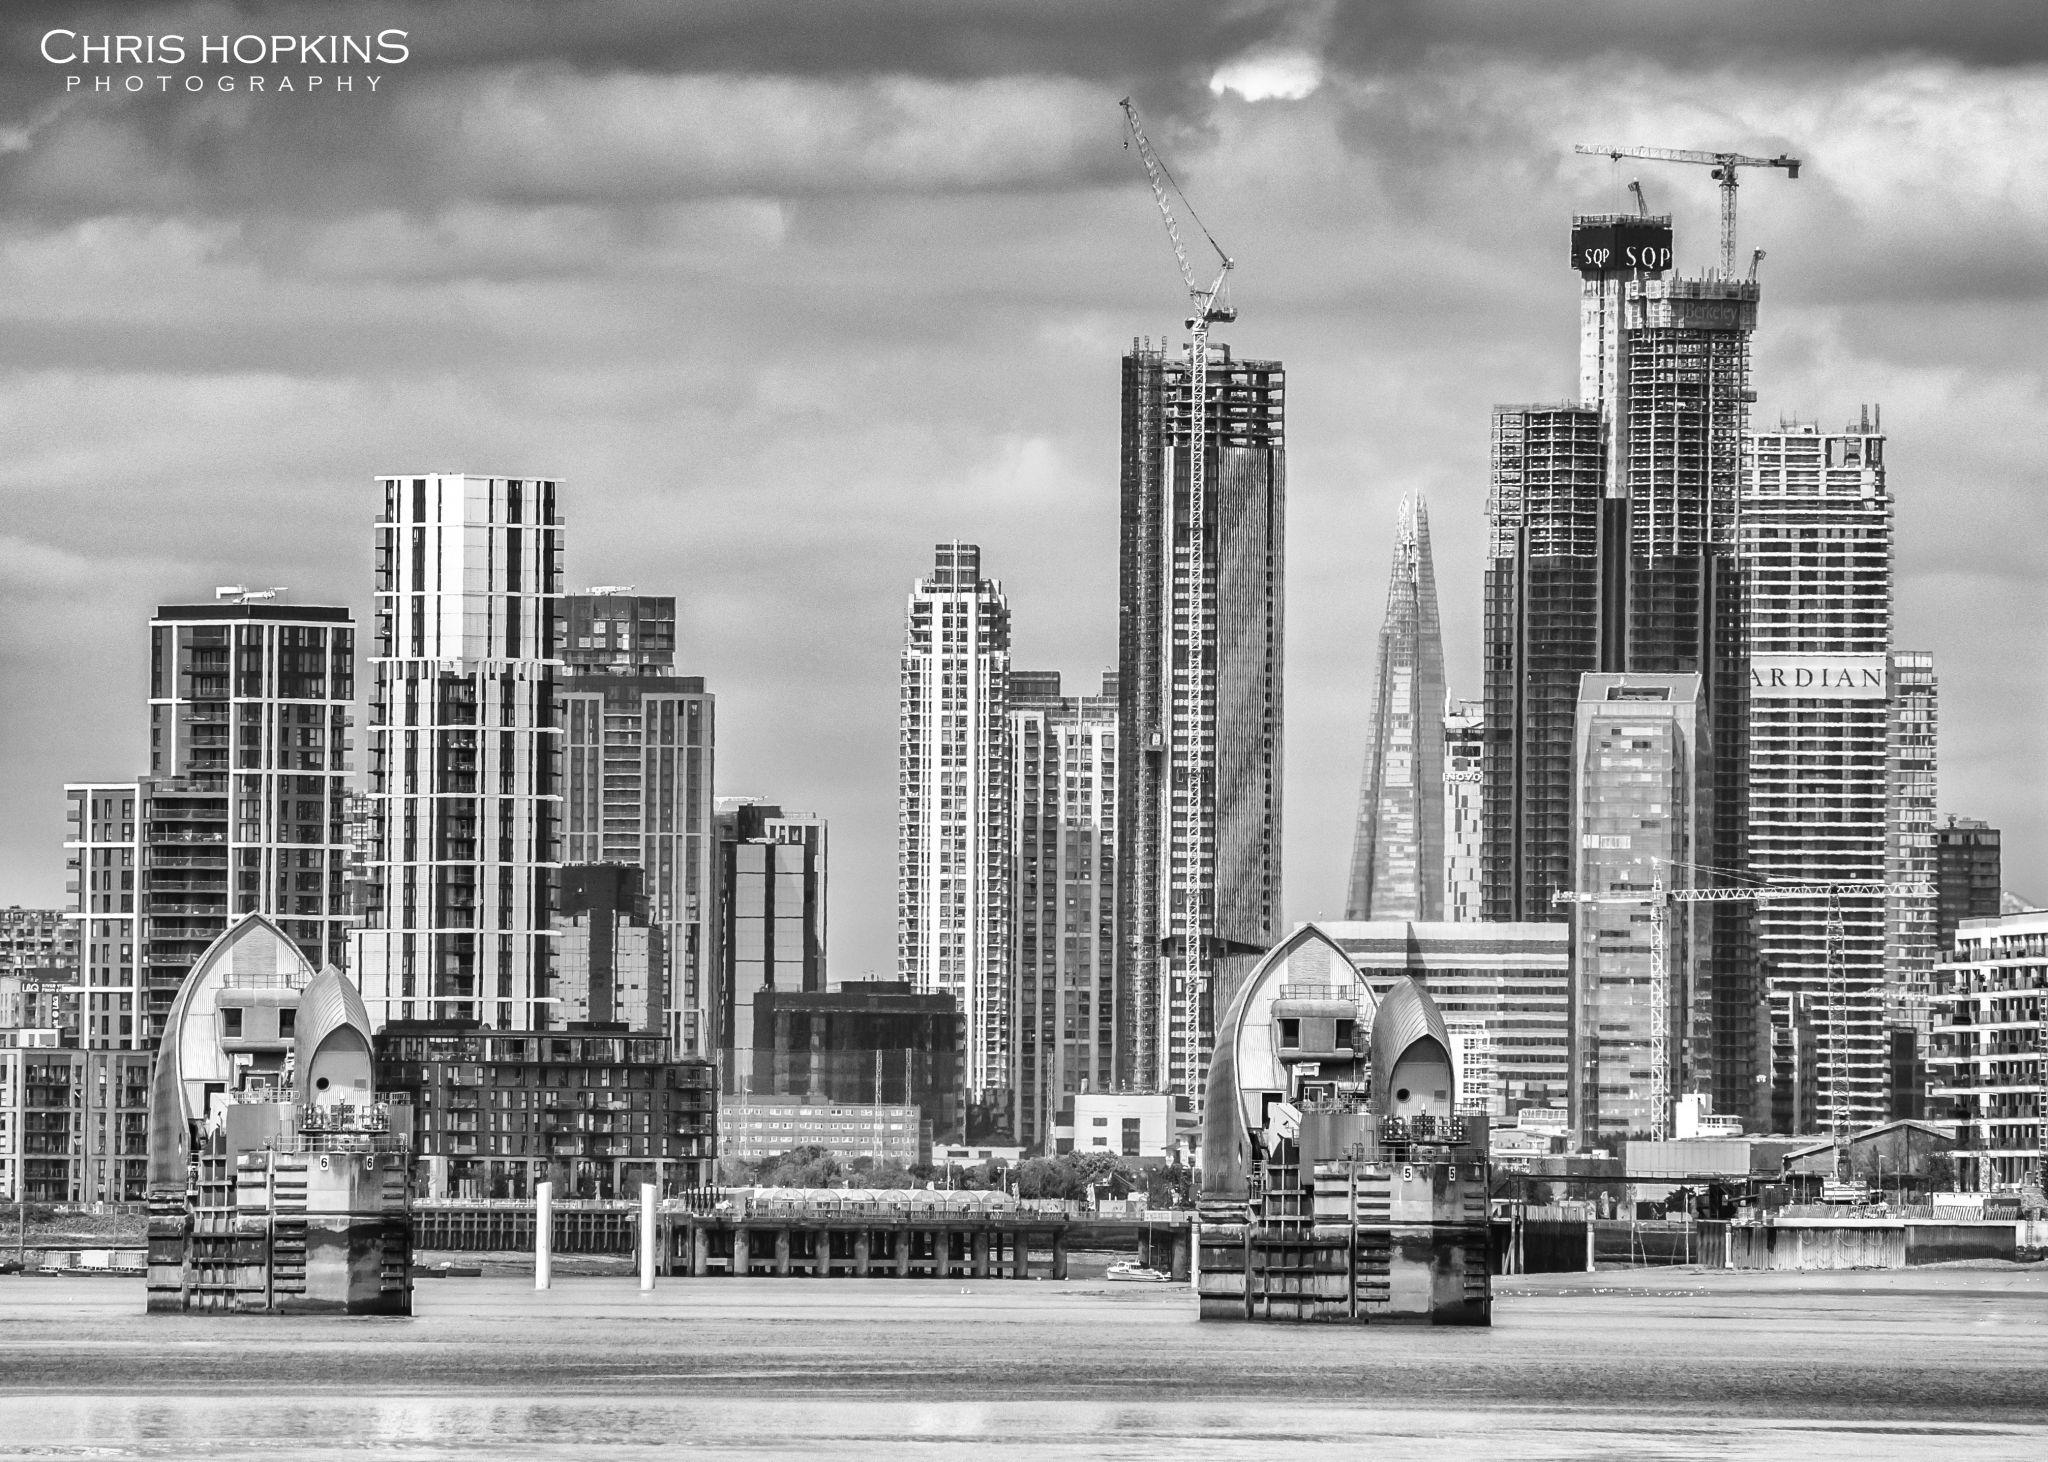 Canary Wharf & Thames Barrier, United Kingdom